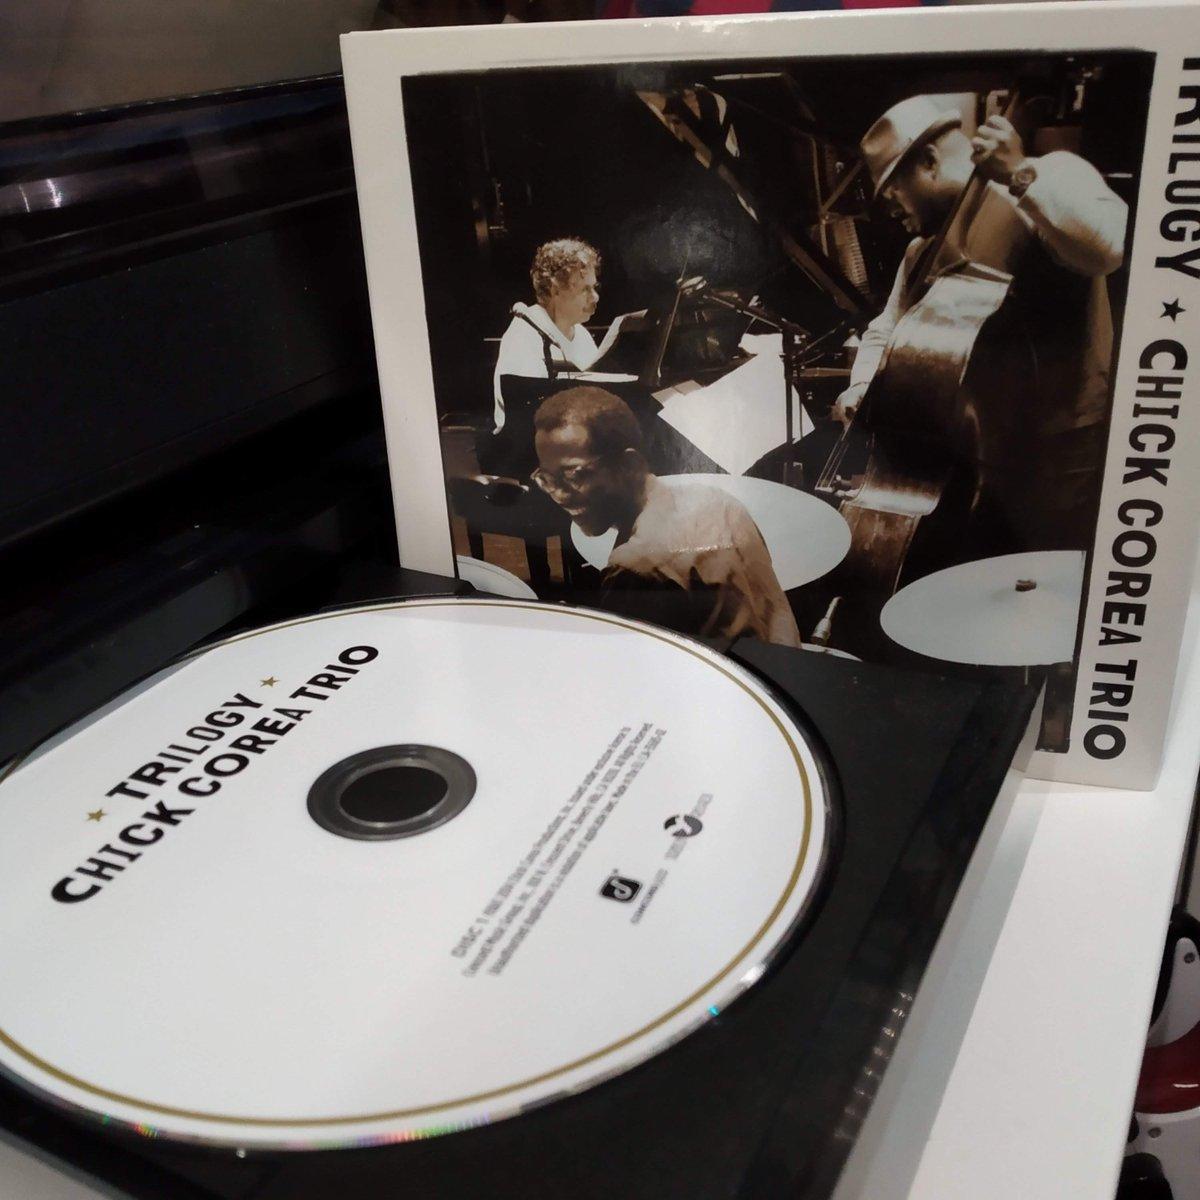 "Chick Corea Trio with Christian McBride & Brian Blade ""Trilogy"" (2014)   Il y a 1 an, 29 février 2020, mon dernier concert...  #CDOfTheDay #NotOnVinyl #ChickCorea #RIP #1YearWithoutConcert #confinement #teletravail #homeoffice #COVID19 #coronavirus"